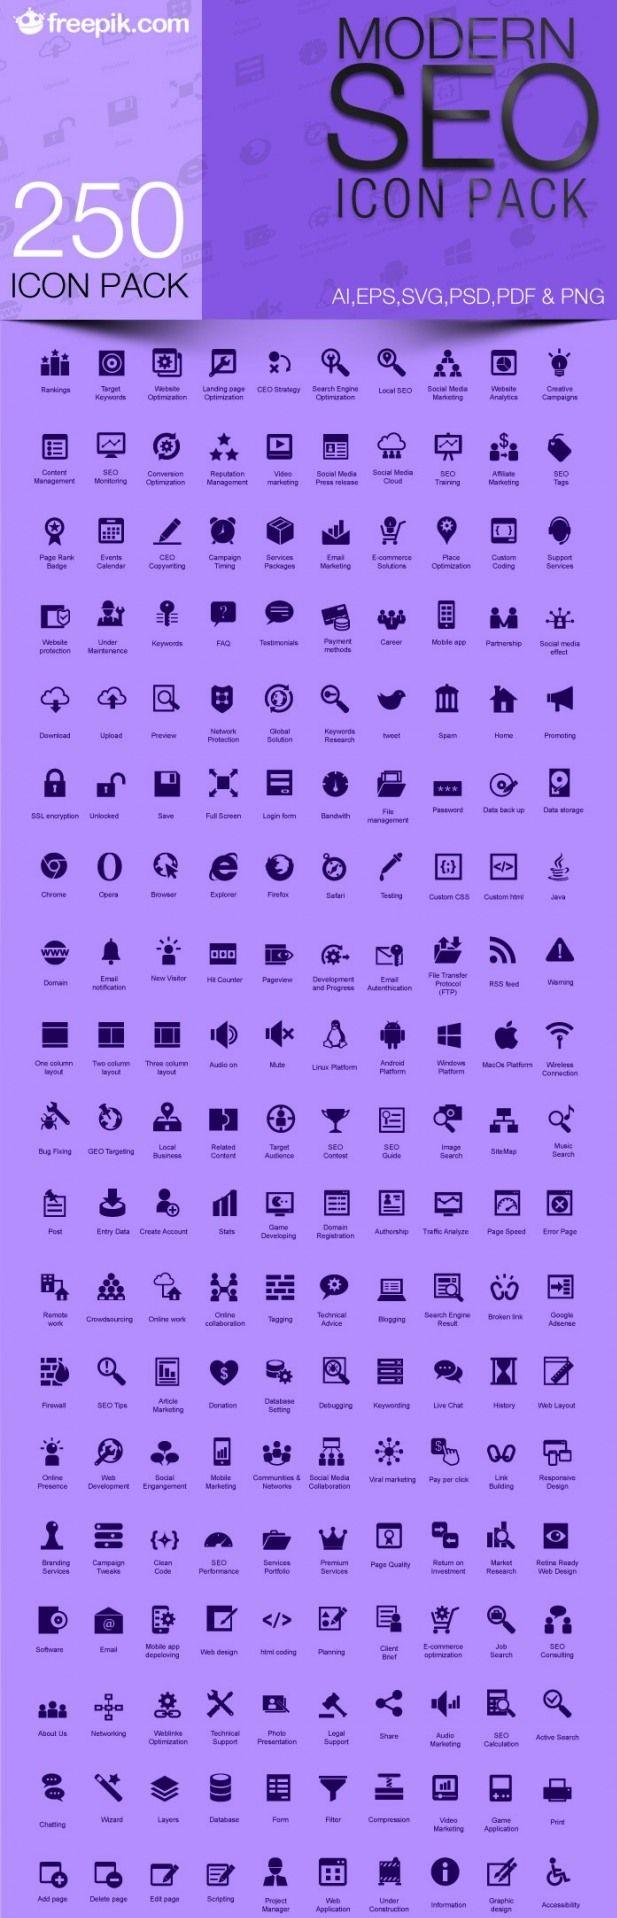 Free Modern SEO Icons